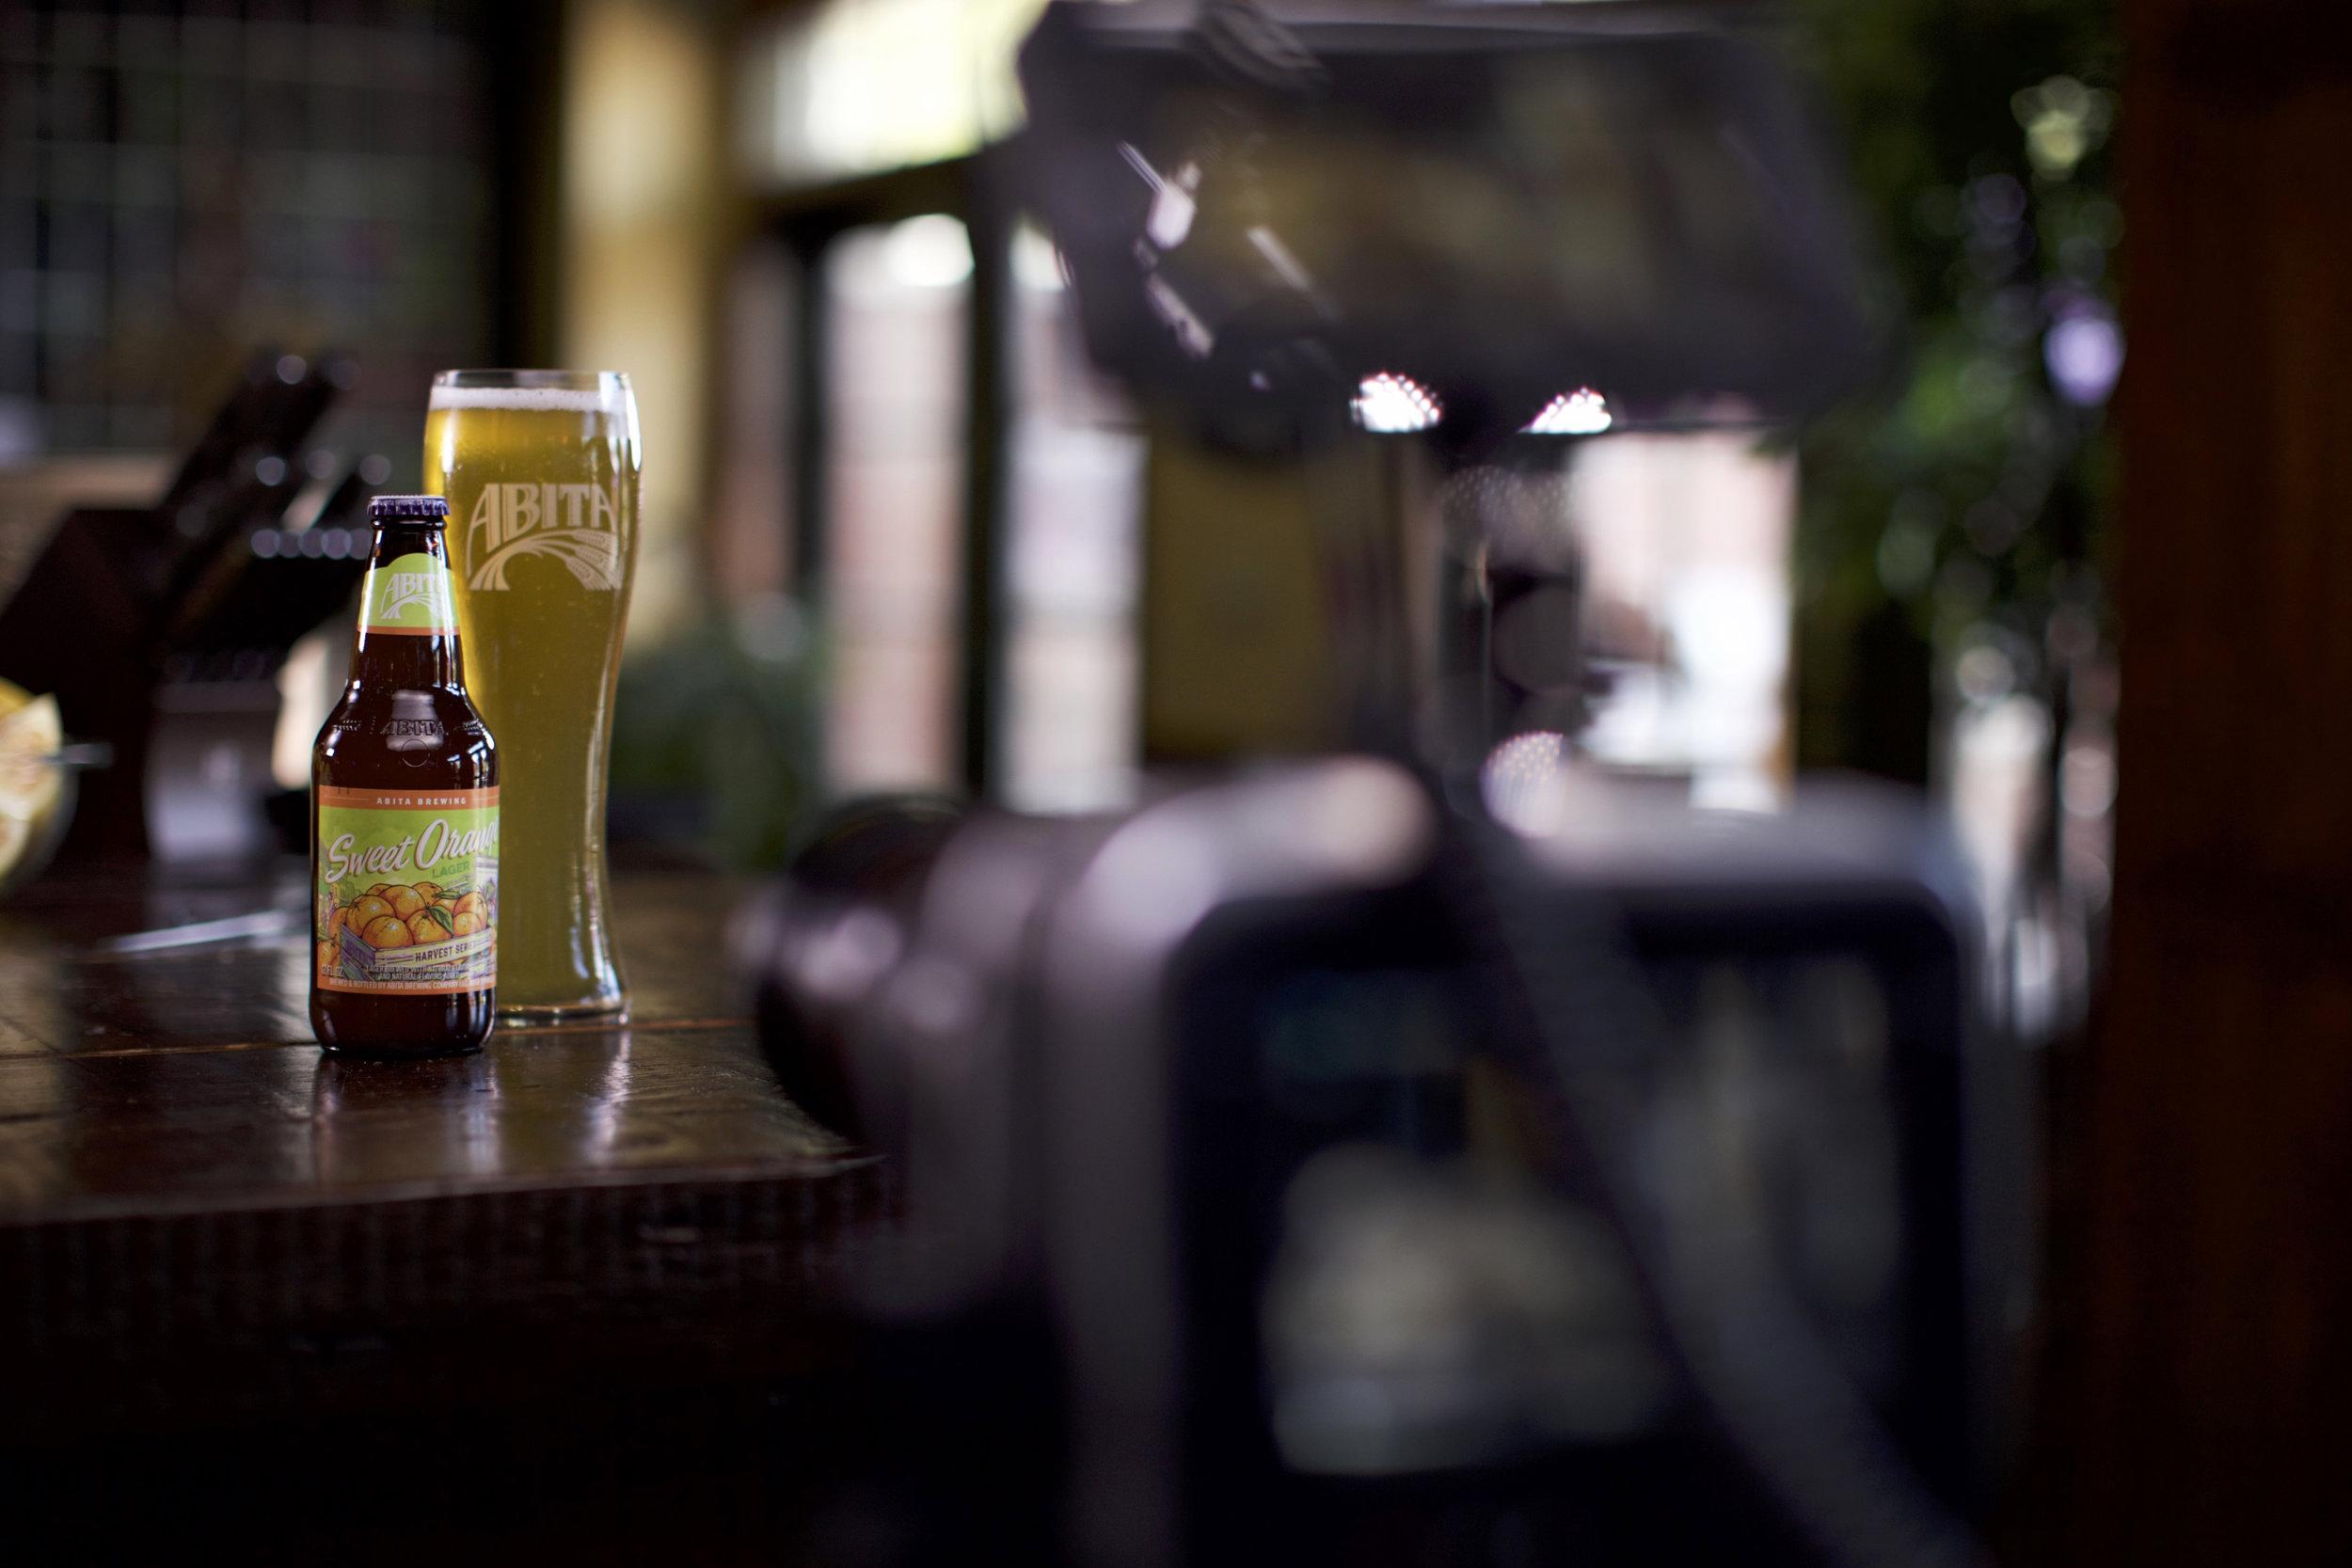 Abita Beer Photo